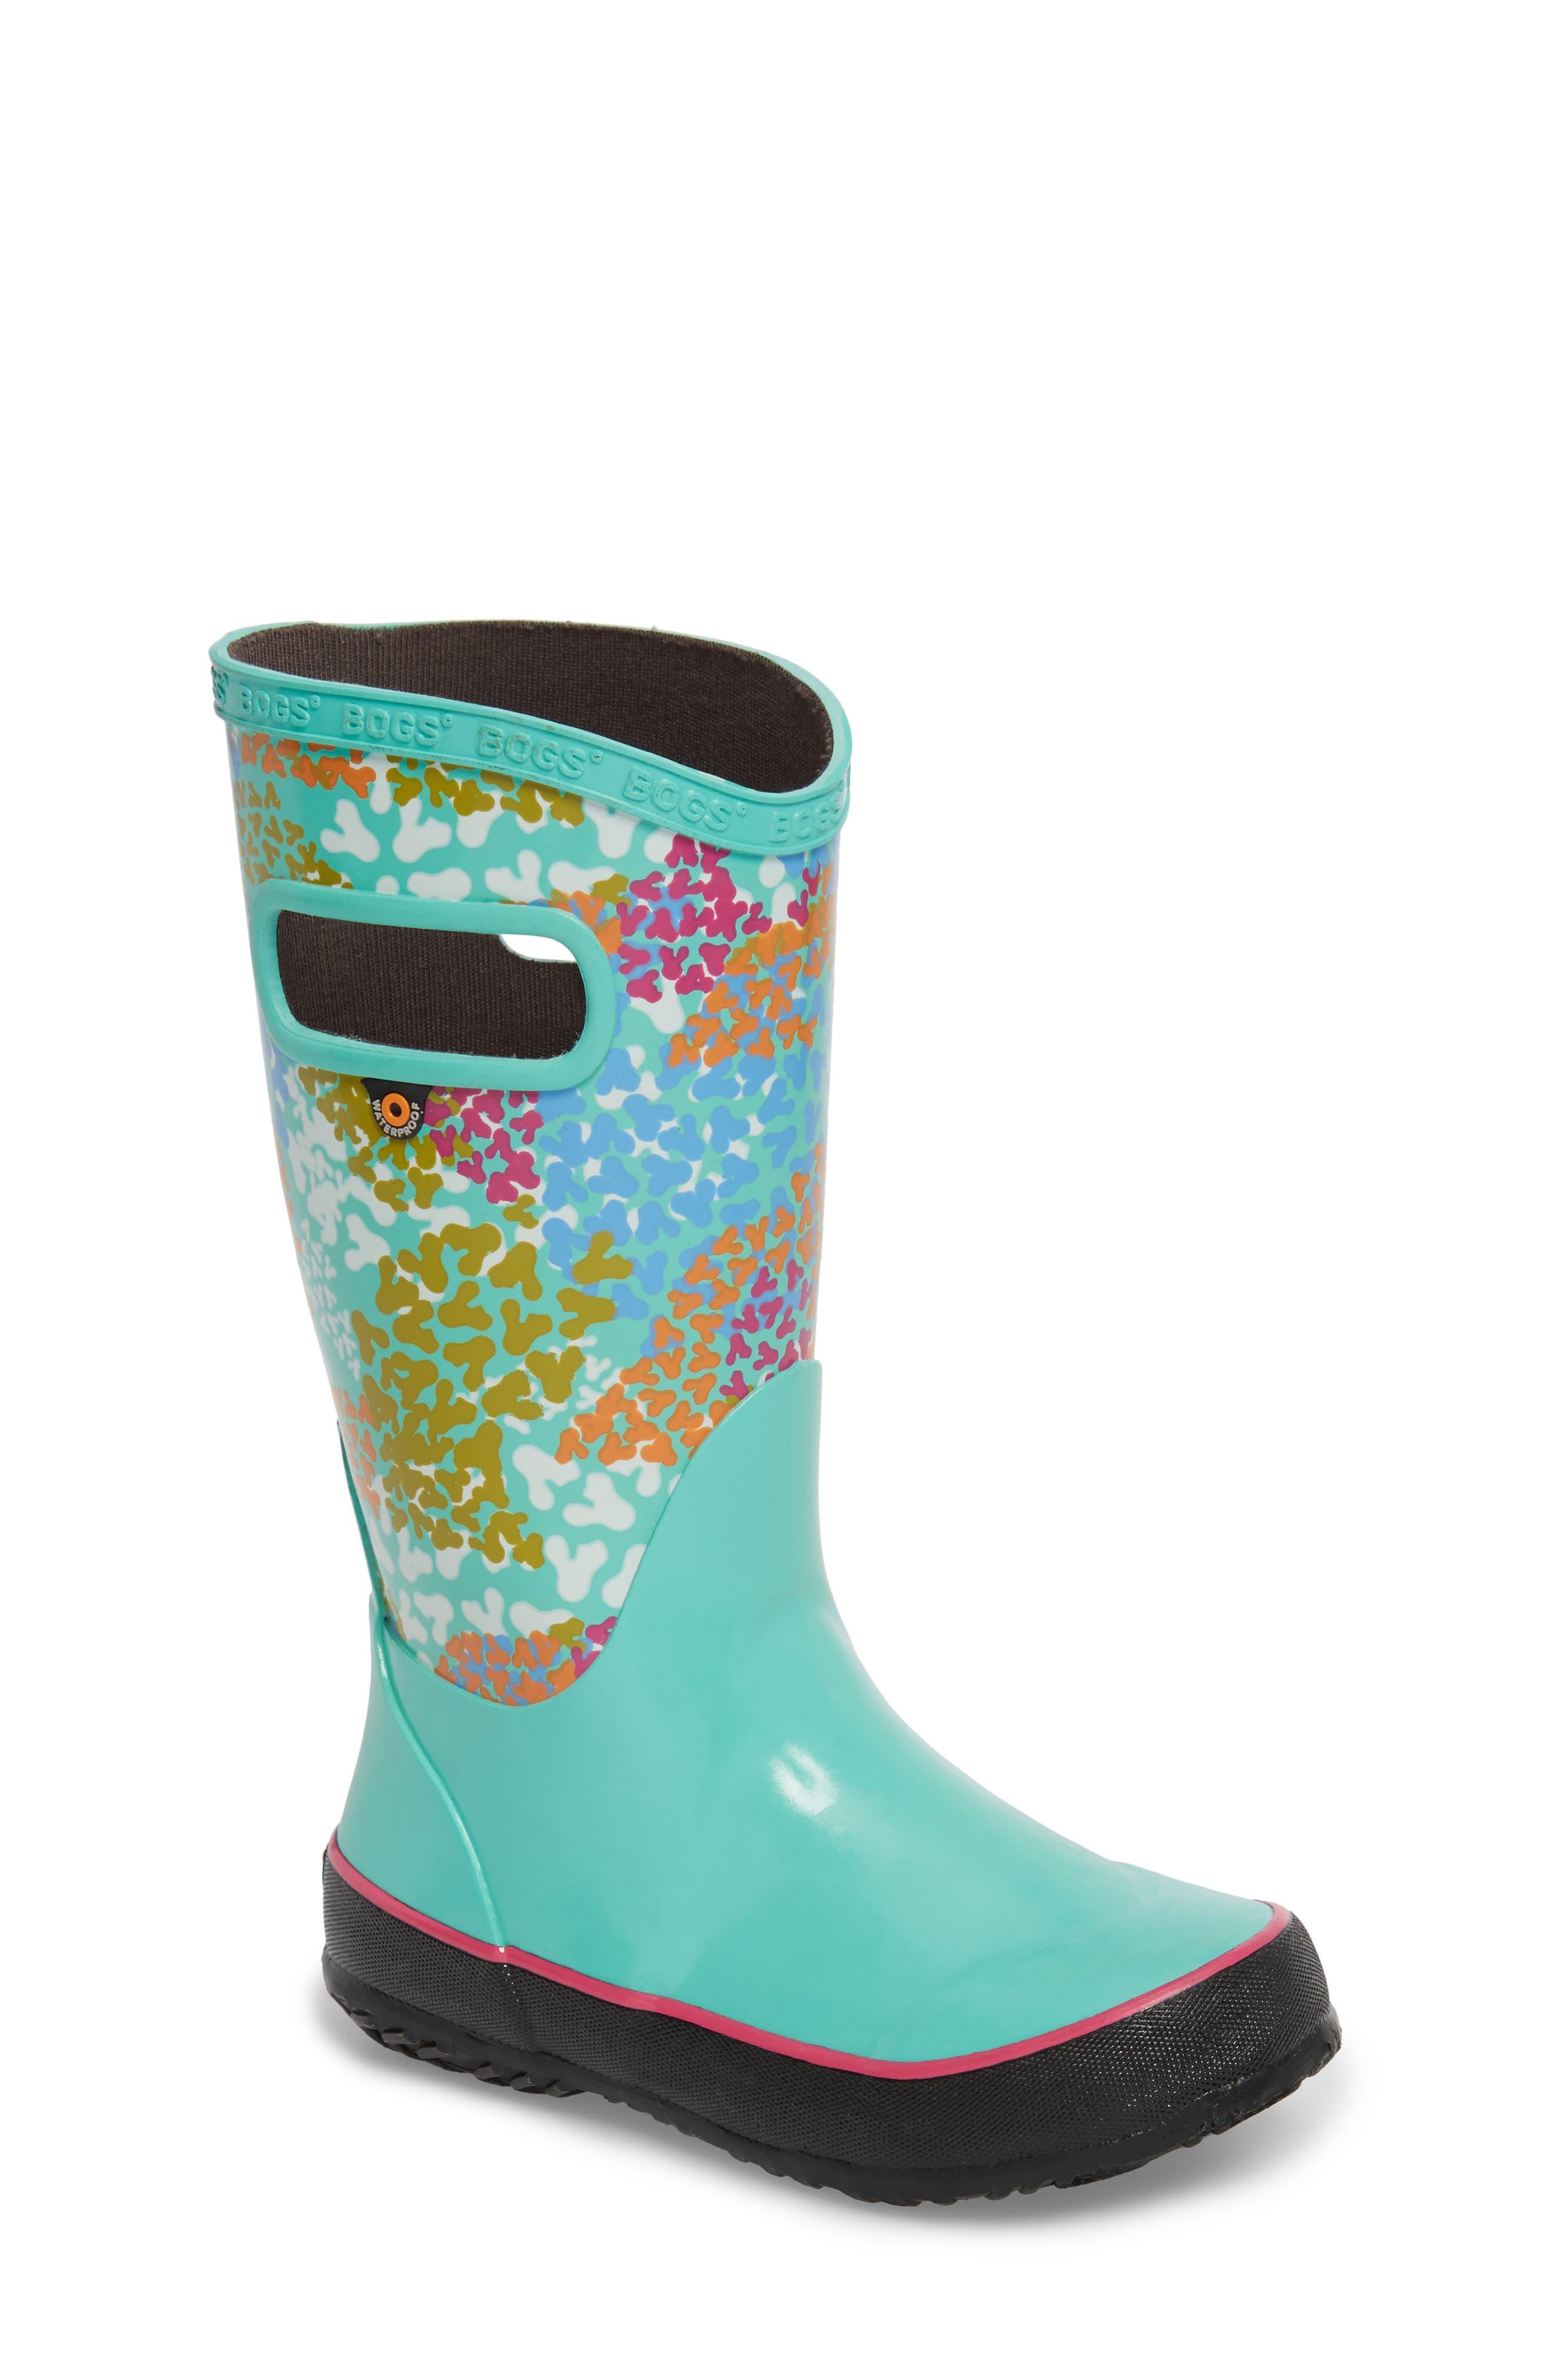 Bogs Skipper Footprints Rubber Rain Boot (Walker, Toddler & Little Kid)